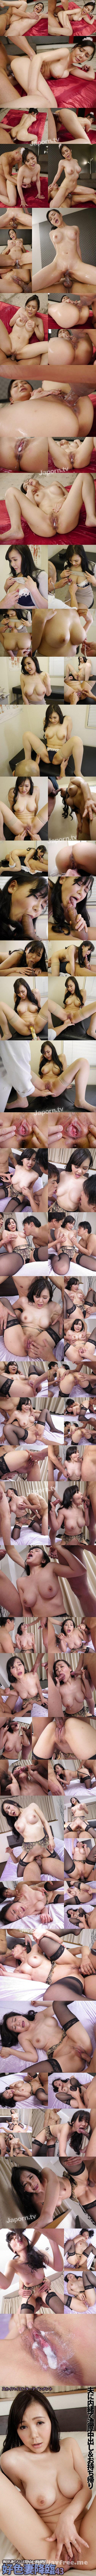 [SKY 288] 好色妻降臨 Vol.43 : 渡辺美羽 渡辺美羽 好色妻降臨 Sky High Ent. Miu Watanabe Dirty Minded Wife Advent